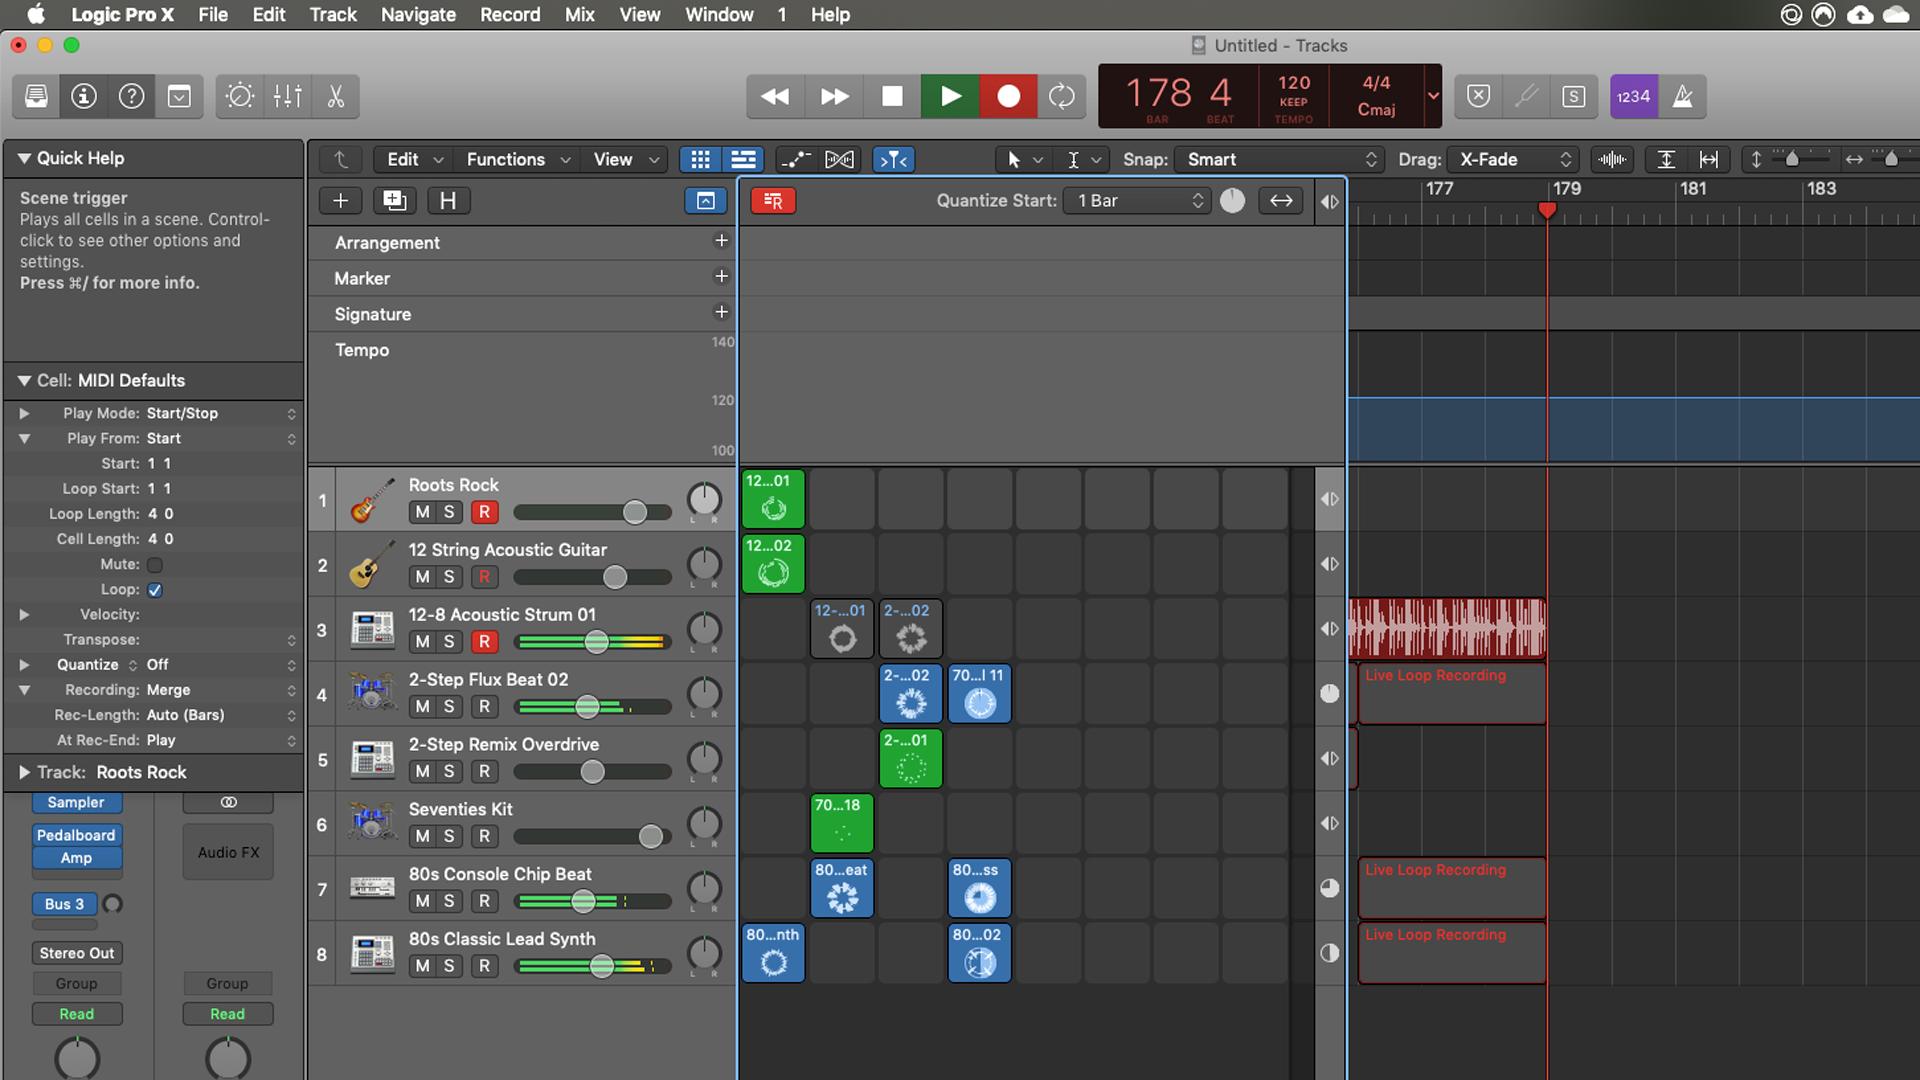 Logic Pro X評論:實時循環錄製